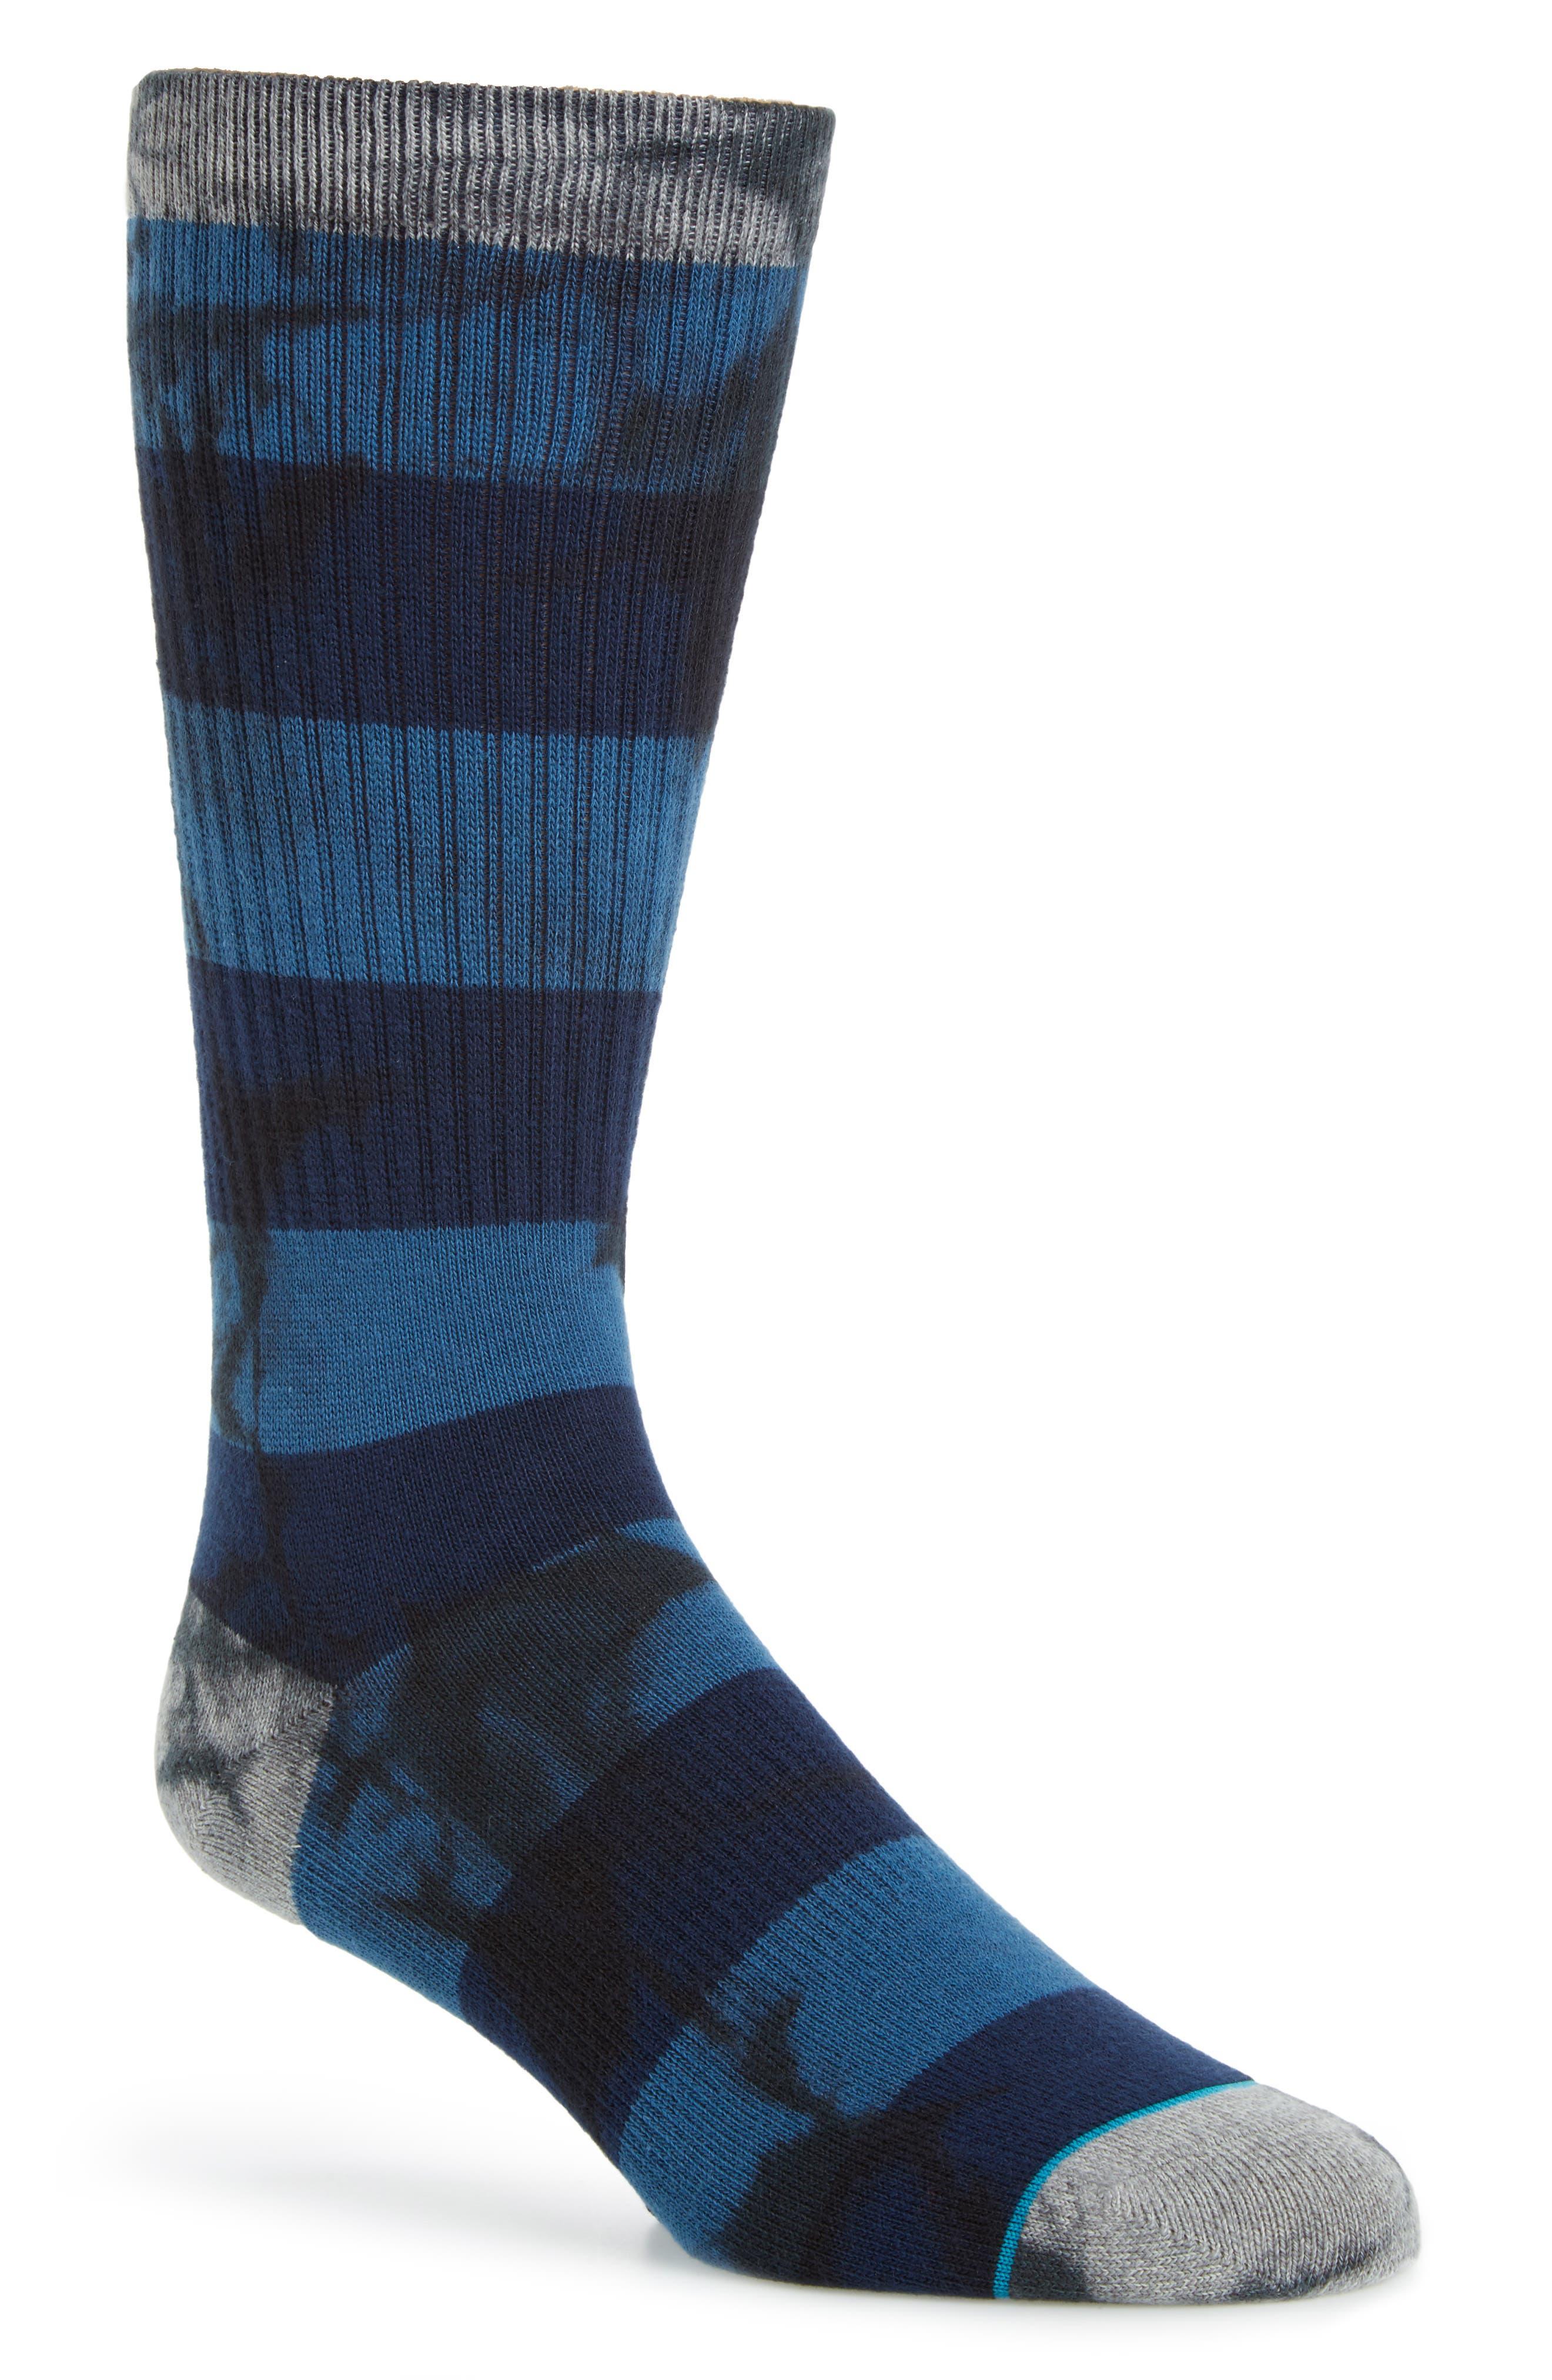 Main Image - Stance Wells Classic Crew Socks